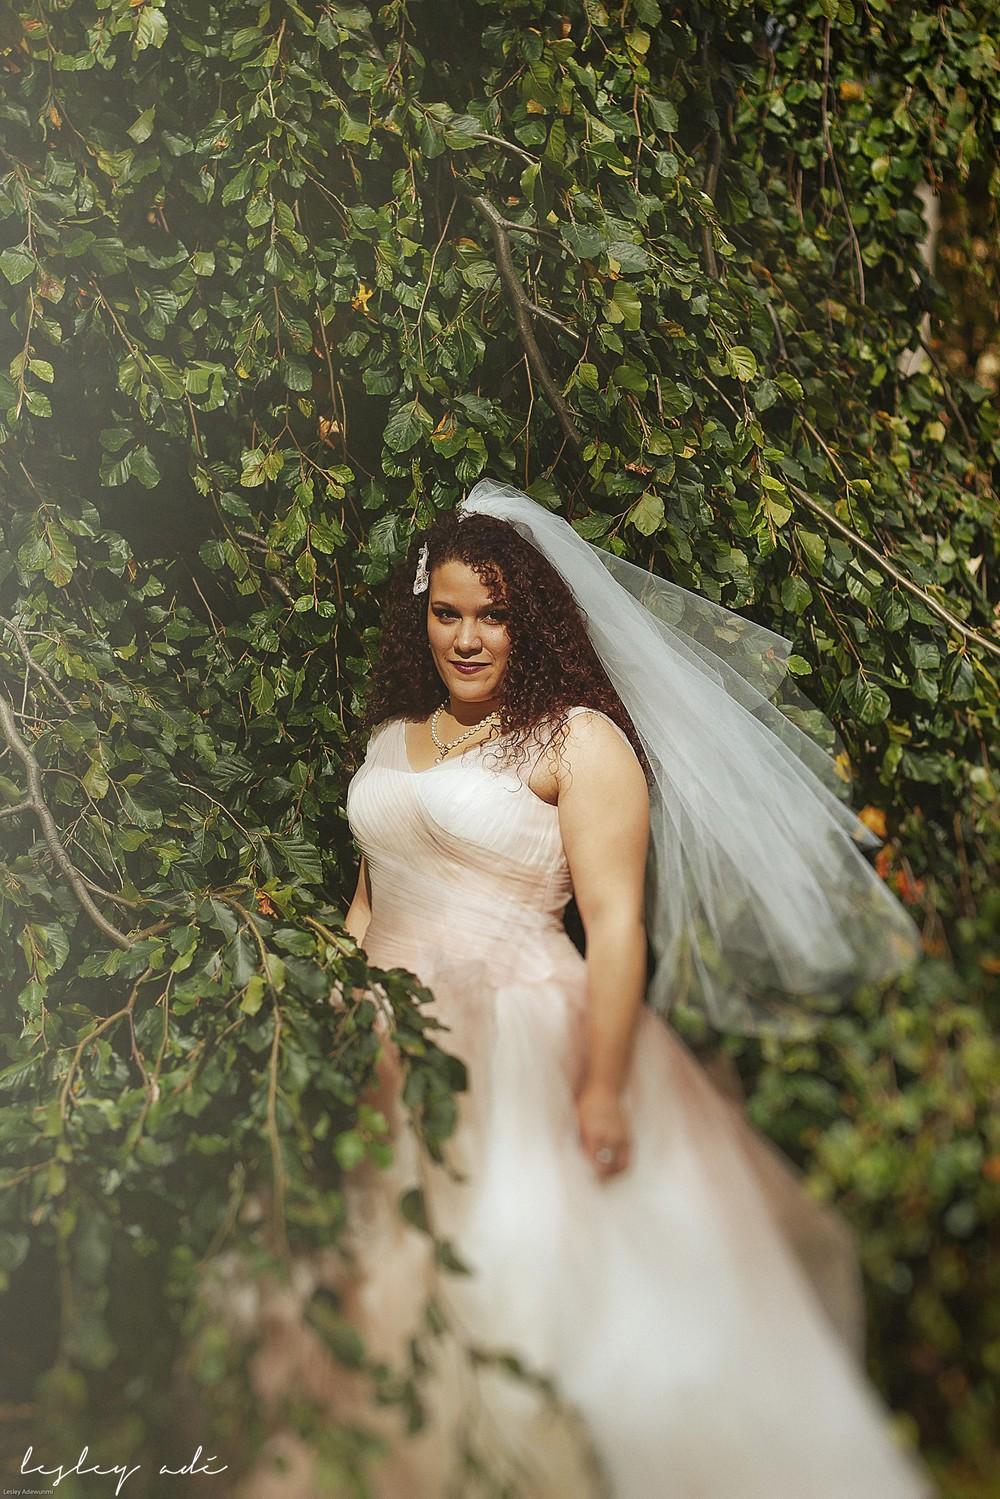 ariel howie umana wedding_lesley ade photo-81.jpg